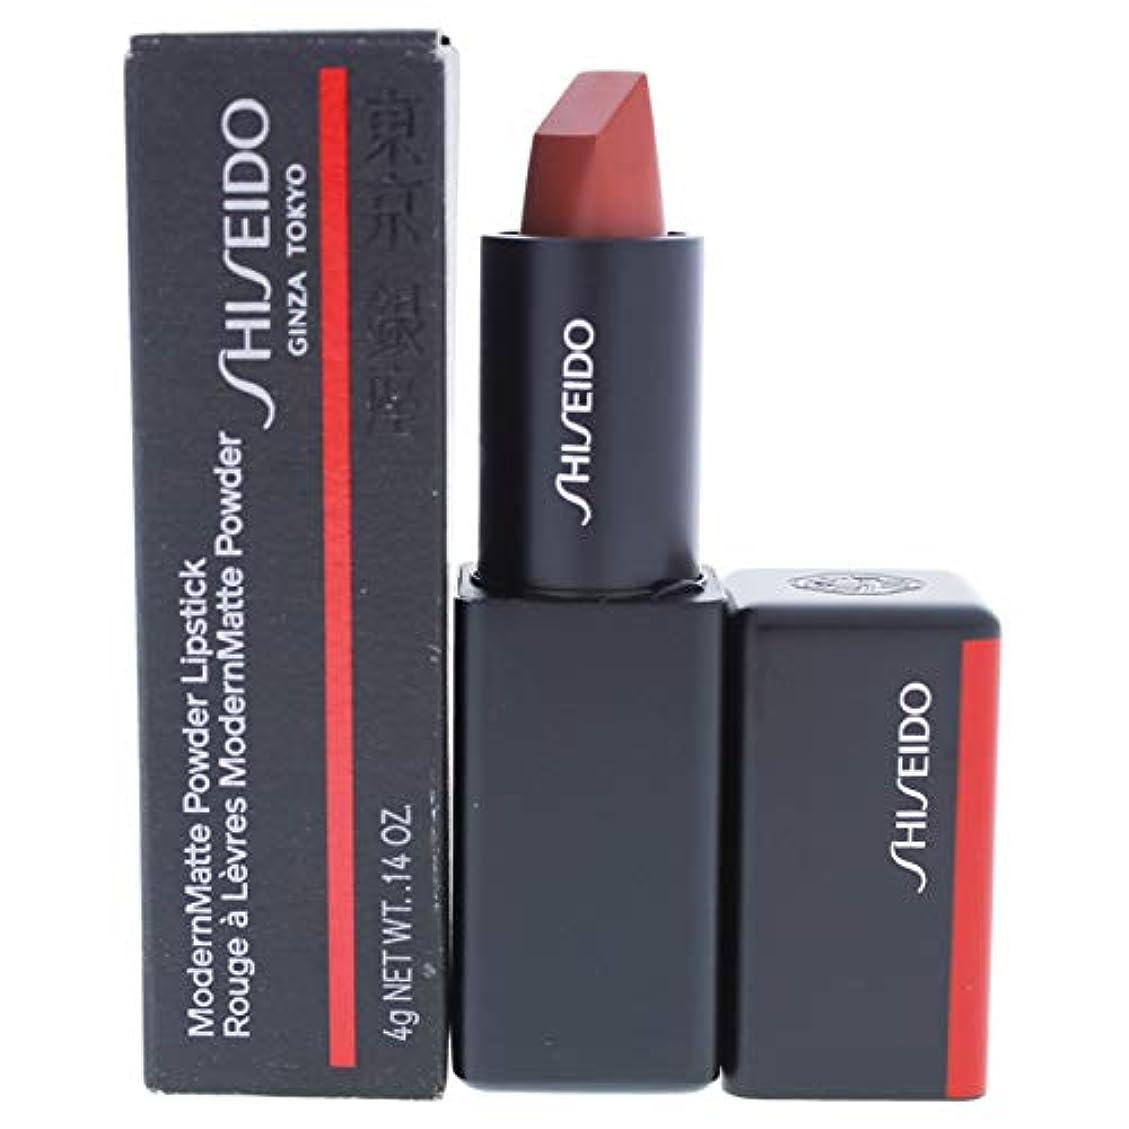 資生堂 ModernMatte Powder Lipstick - # 508 Semi Nude (Cinnamon) 4g/0.14oz並行輸入品